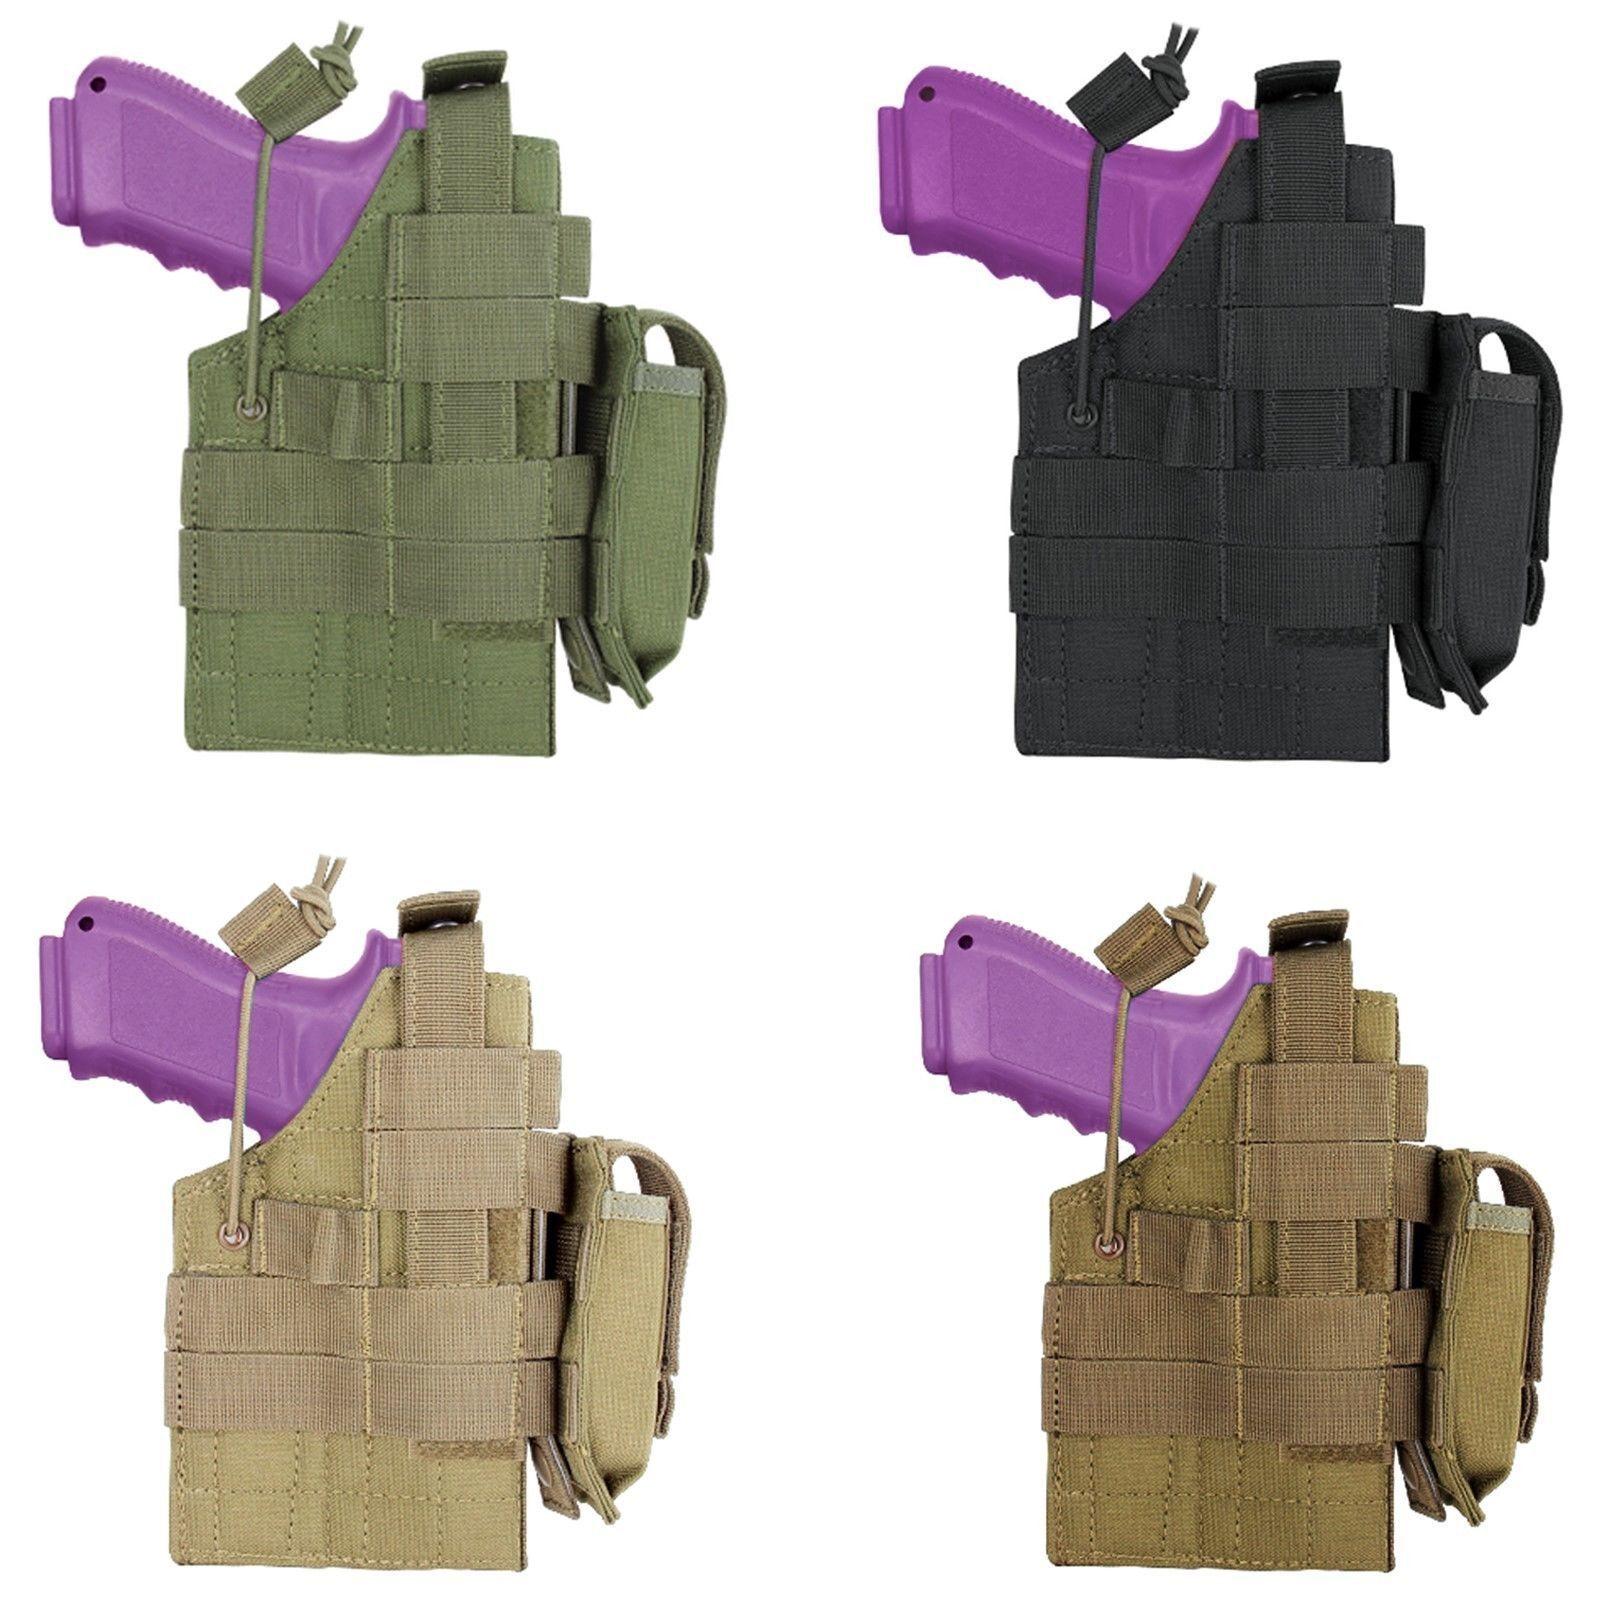 Condor H-Glock Tactical MOLLE Ambidextrous Glock Pistol Hols